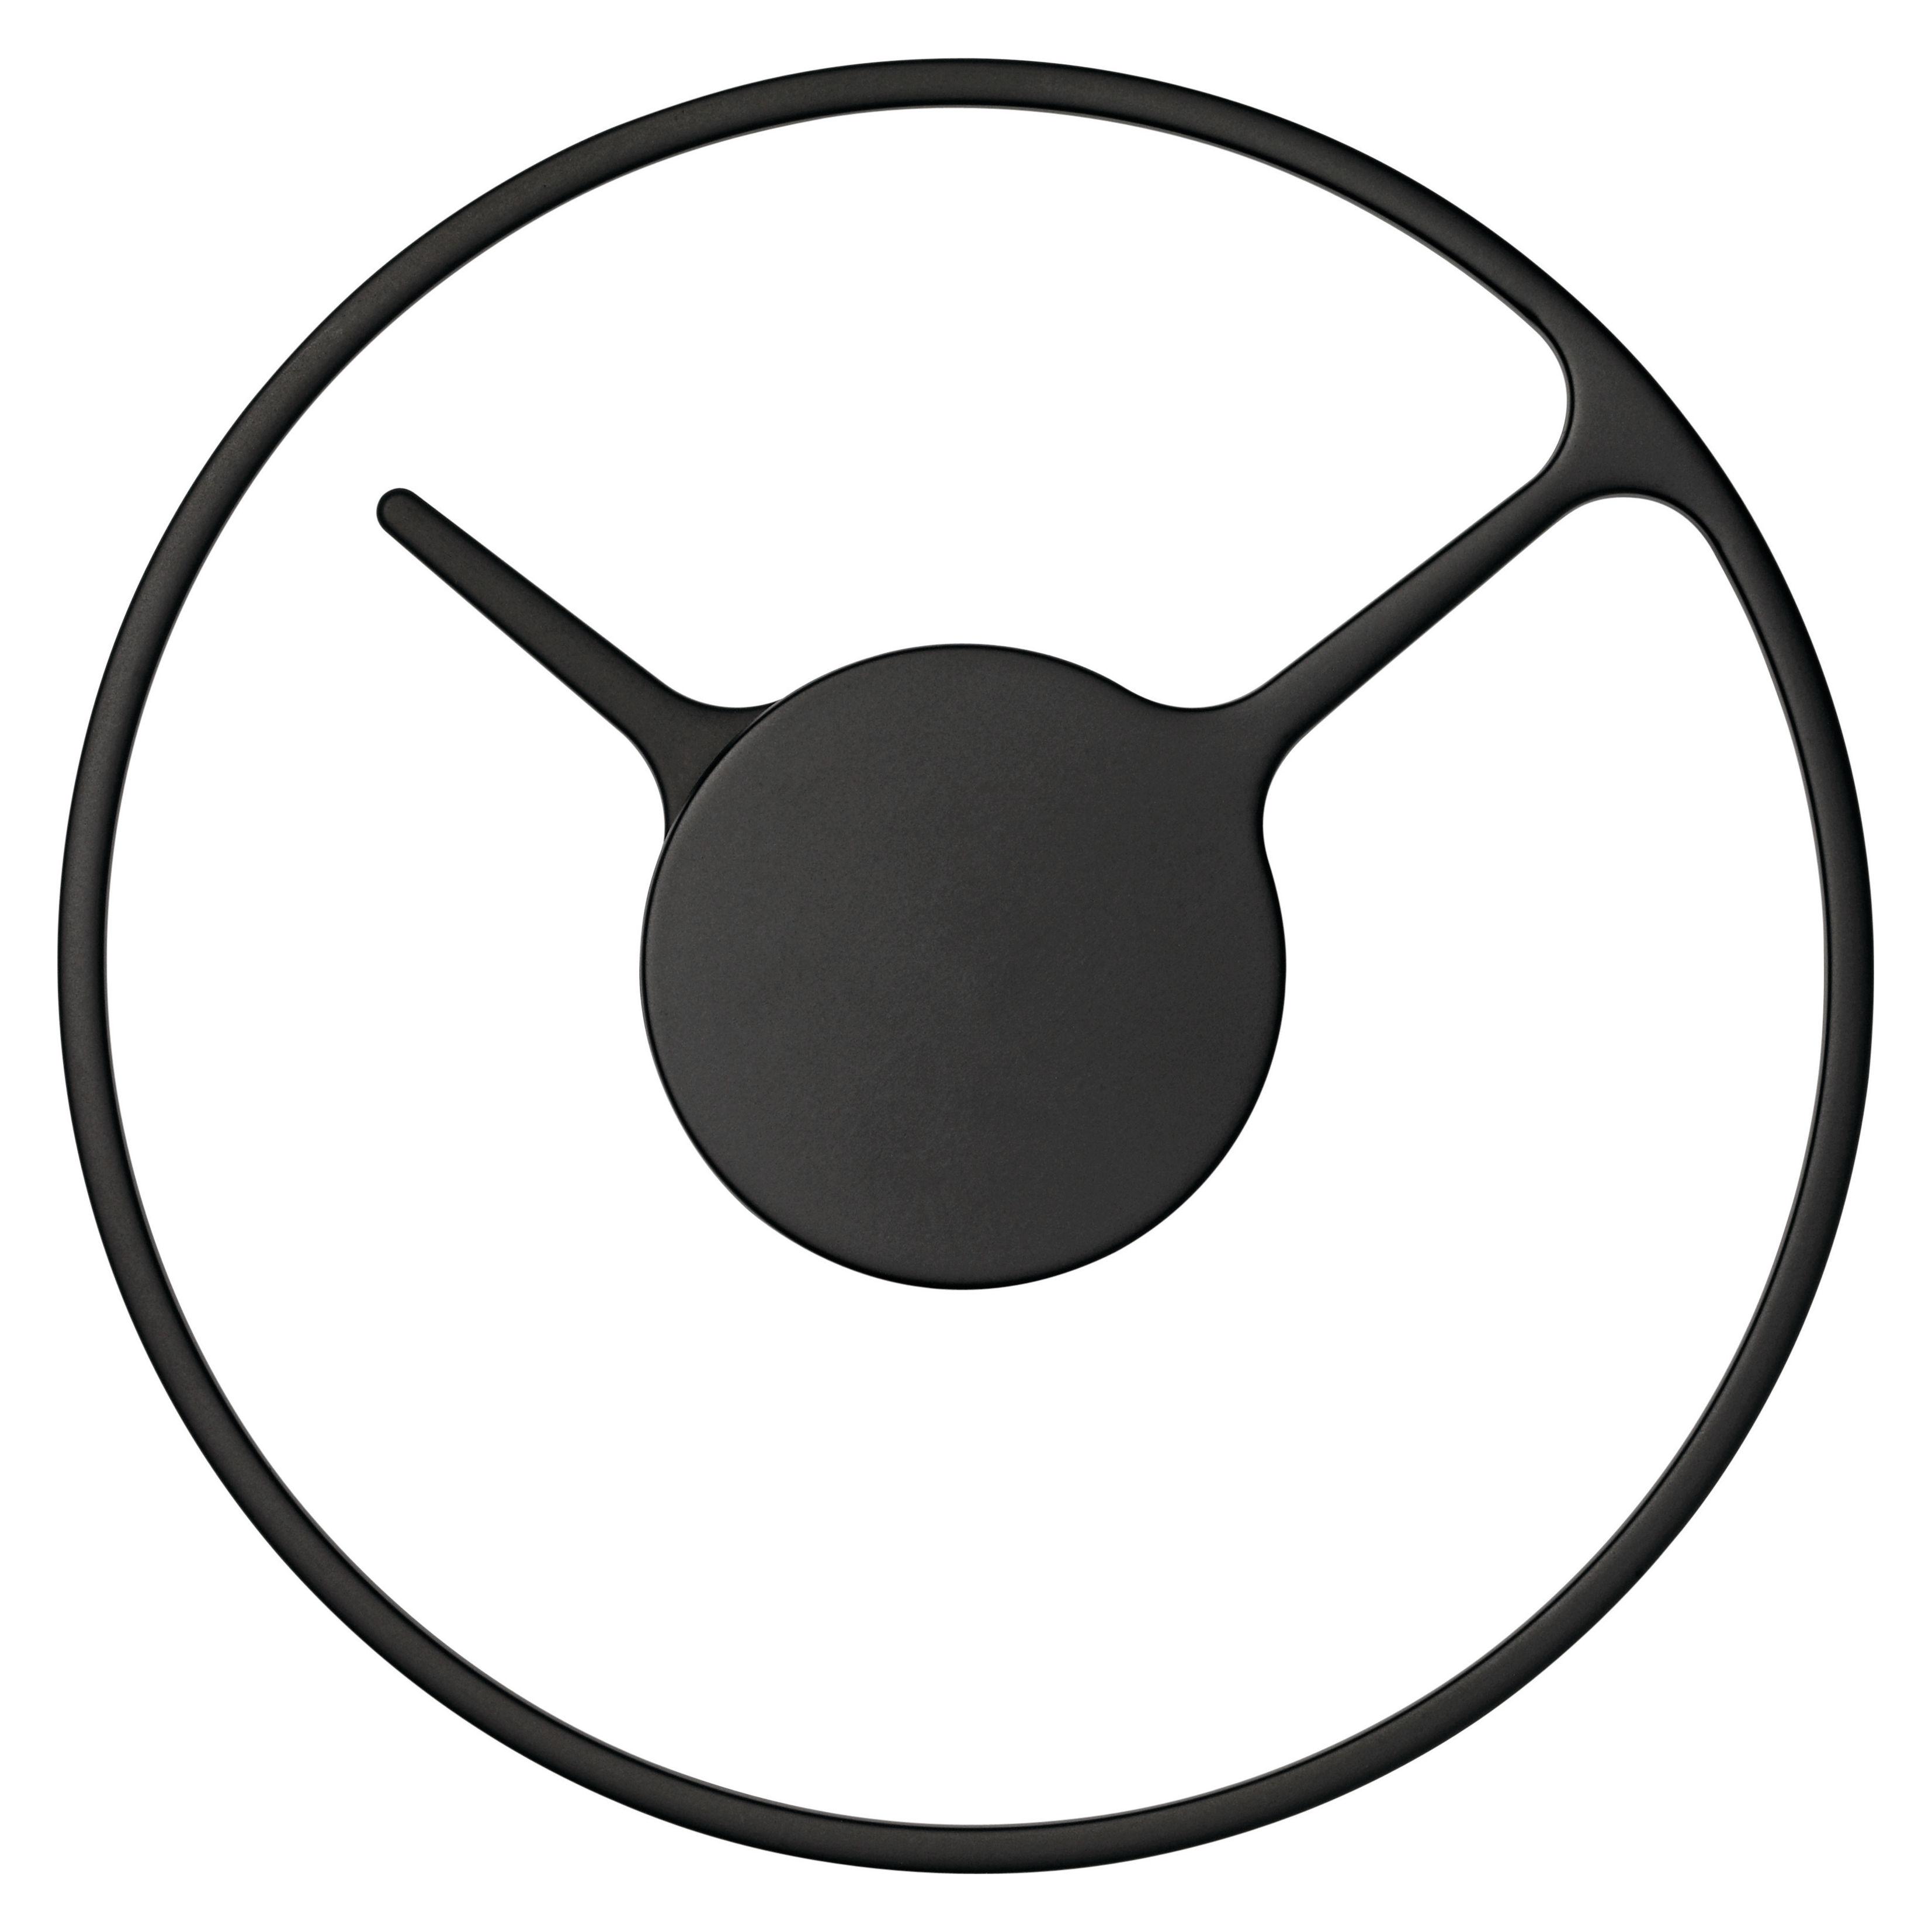 Interni - Orologi  - Orologio a parete Stelton Time Medium / Ø 22 cm - Stelton - Nero - Alluminio